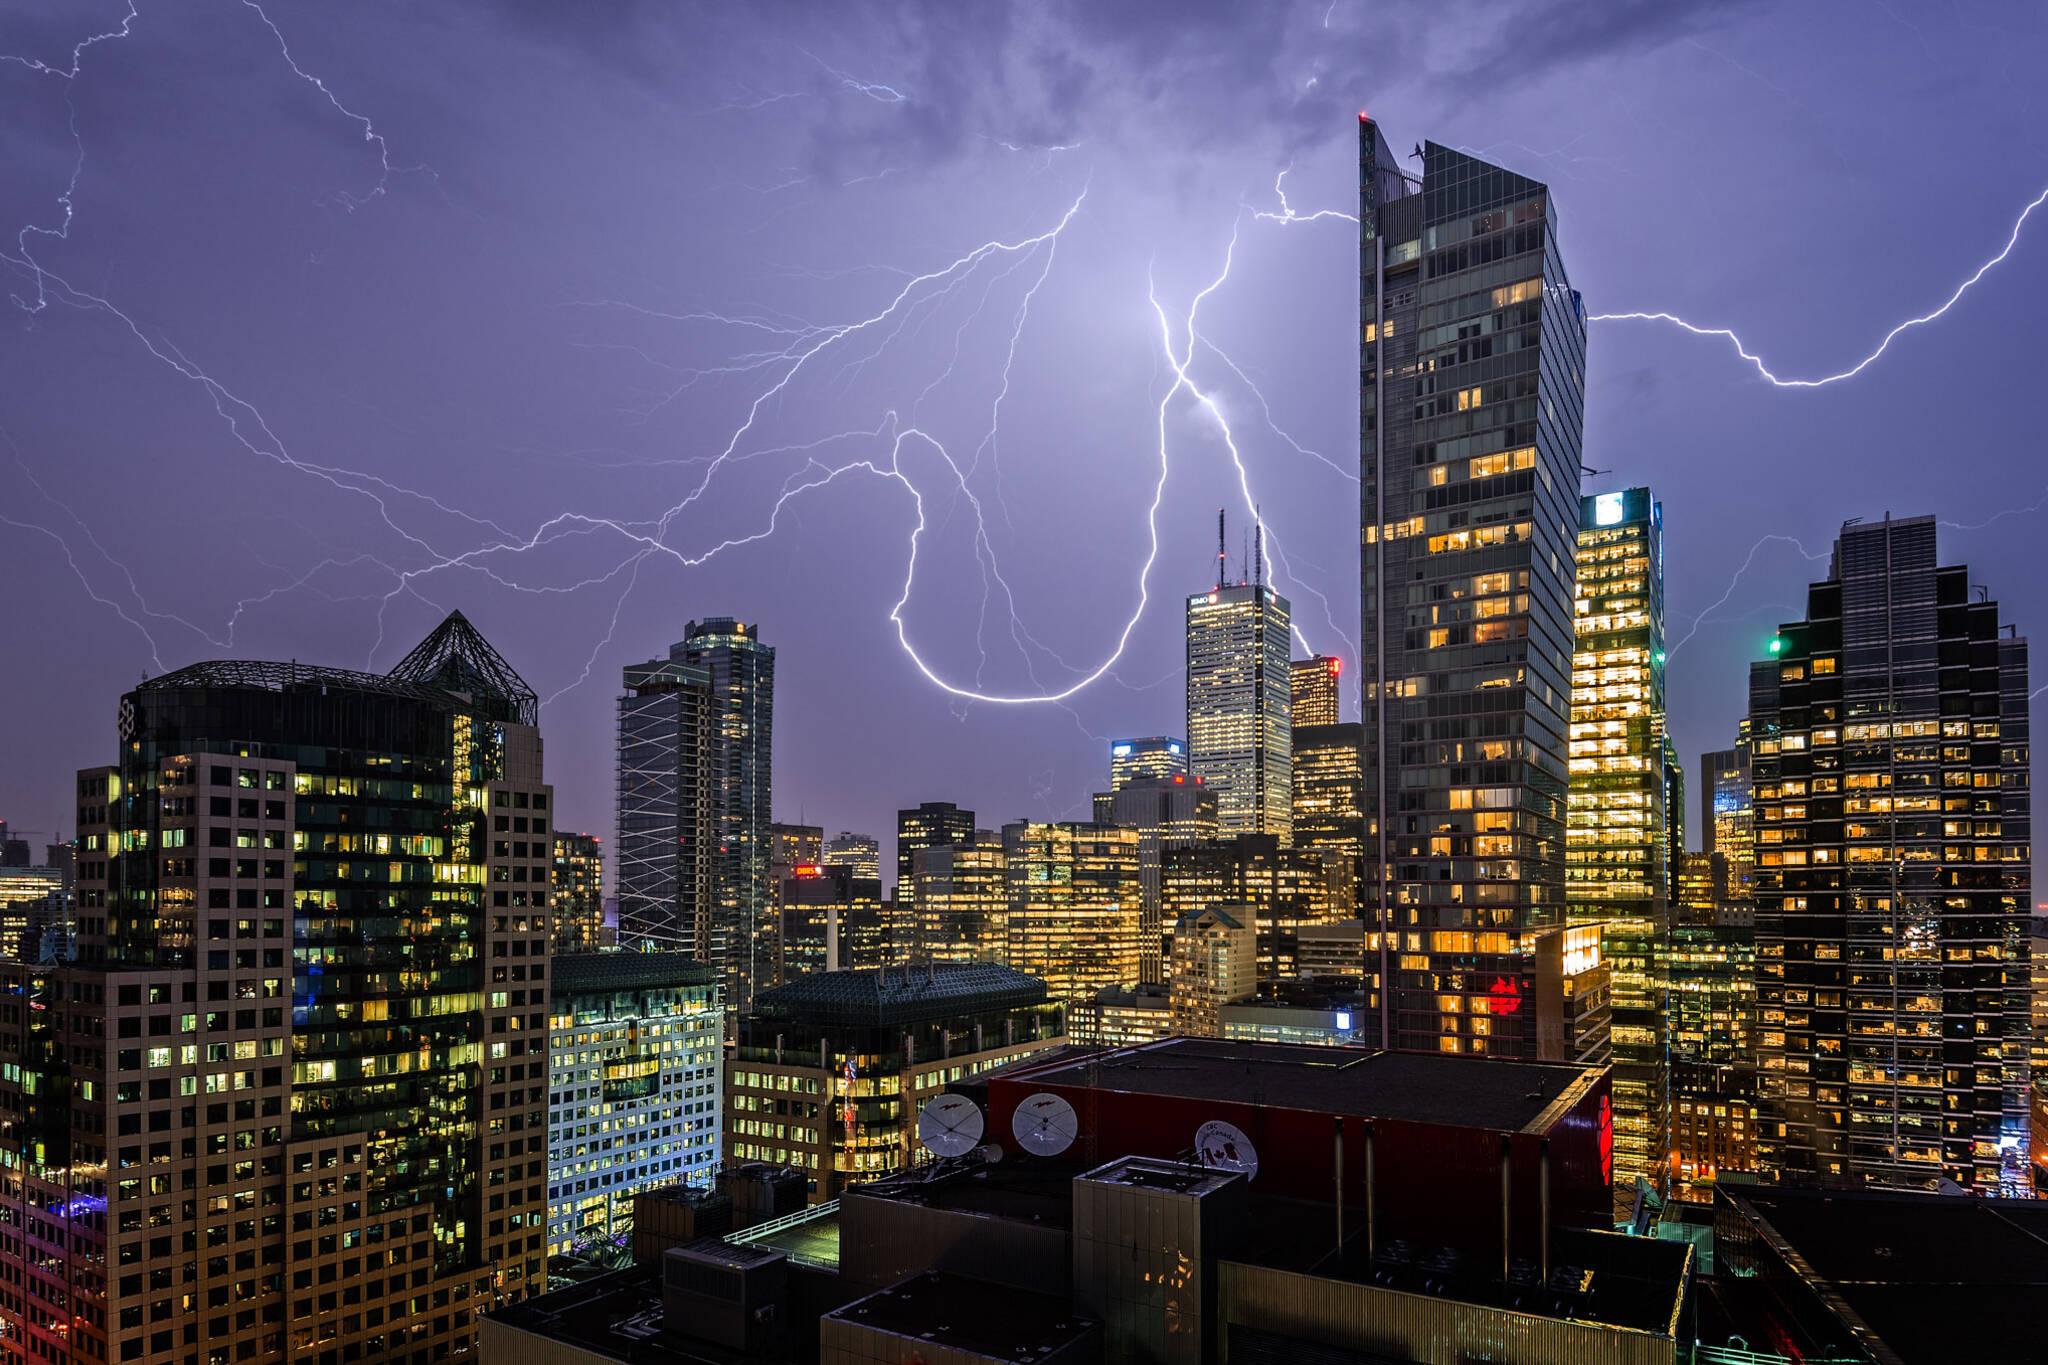 toronto thunderstorm weekend